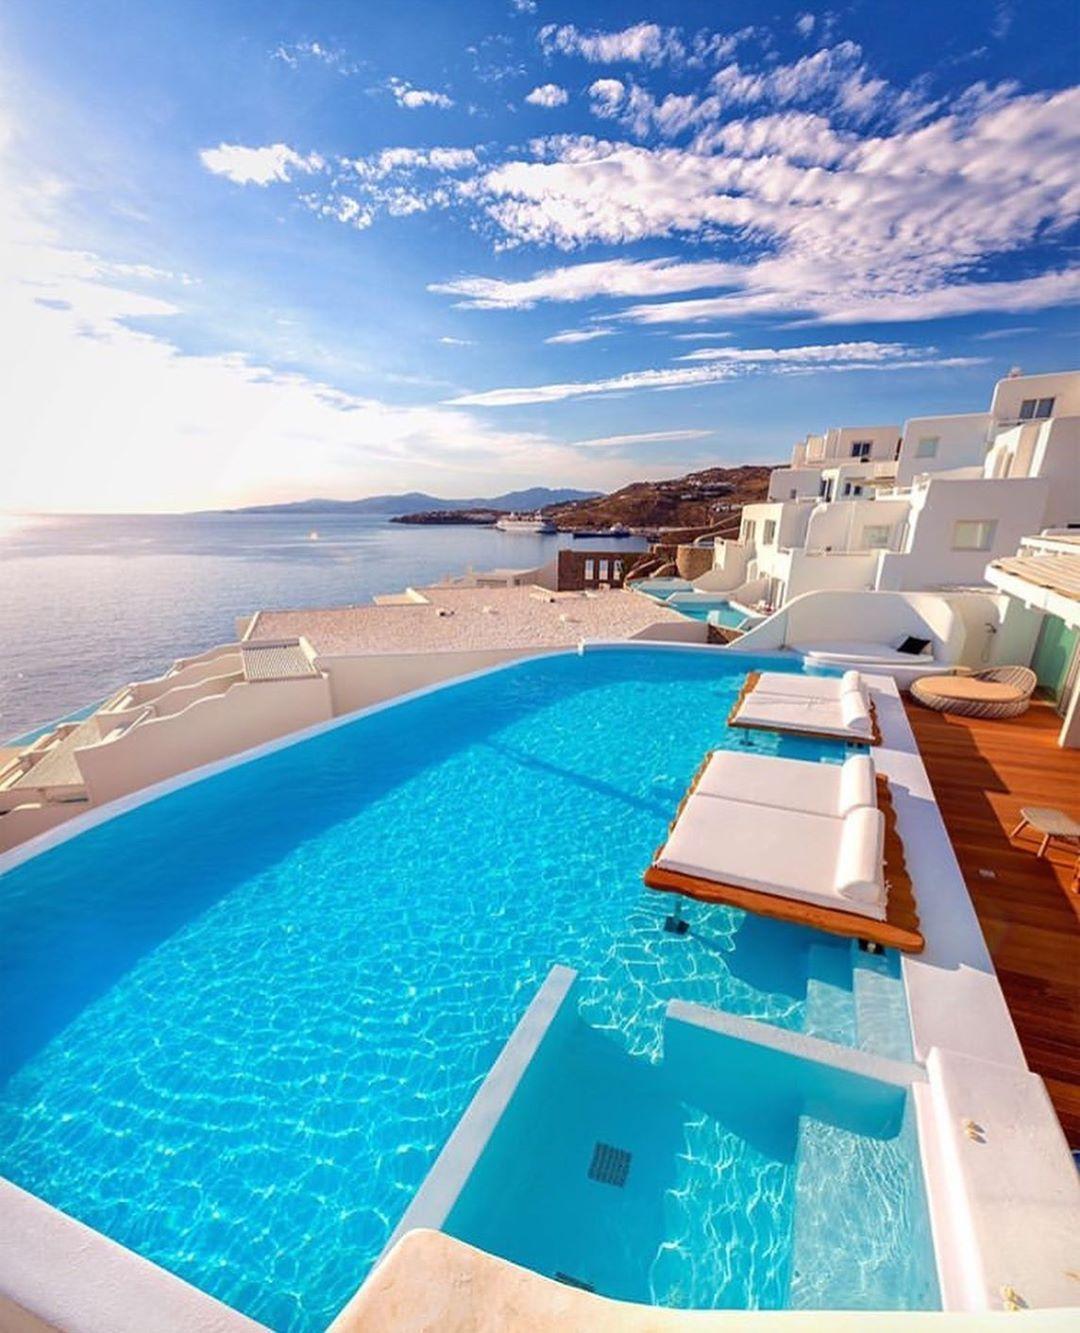 Cavo Tagoo Mykonos Hotel 5 Star Hotel Tourism World